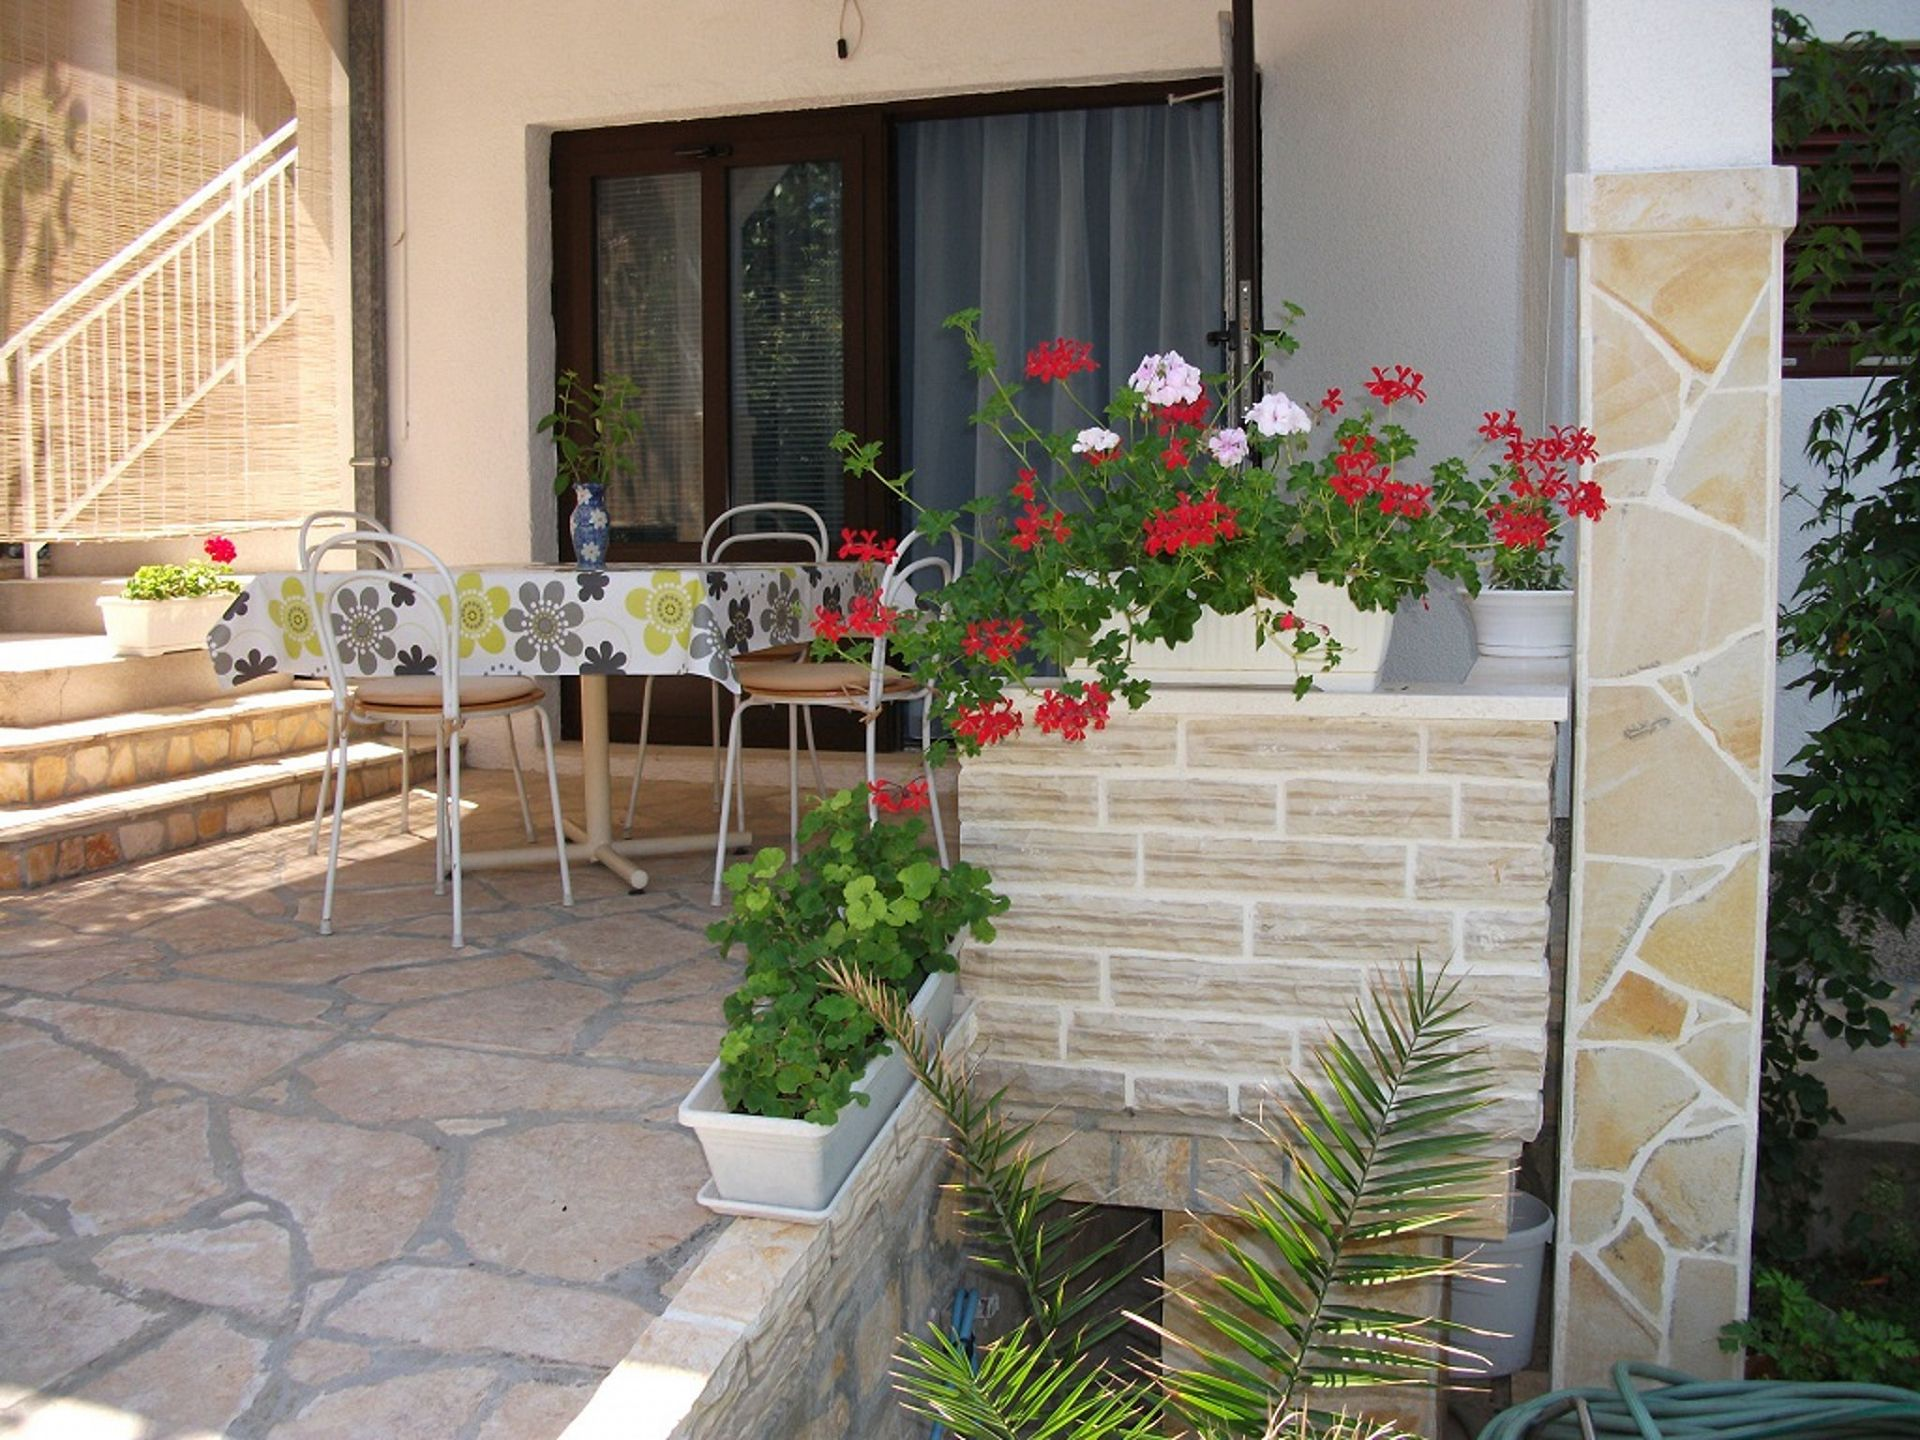 Ferienwohnung Dusko A1(2+3) - Gornji Karin (802127), Obrovac, , Dalmatien, Kroatien, Bild 3